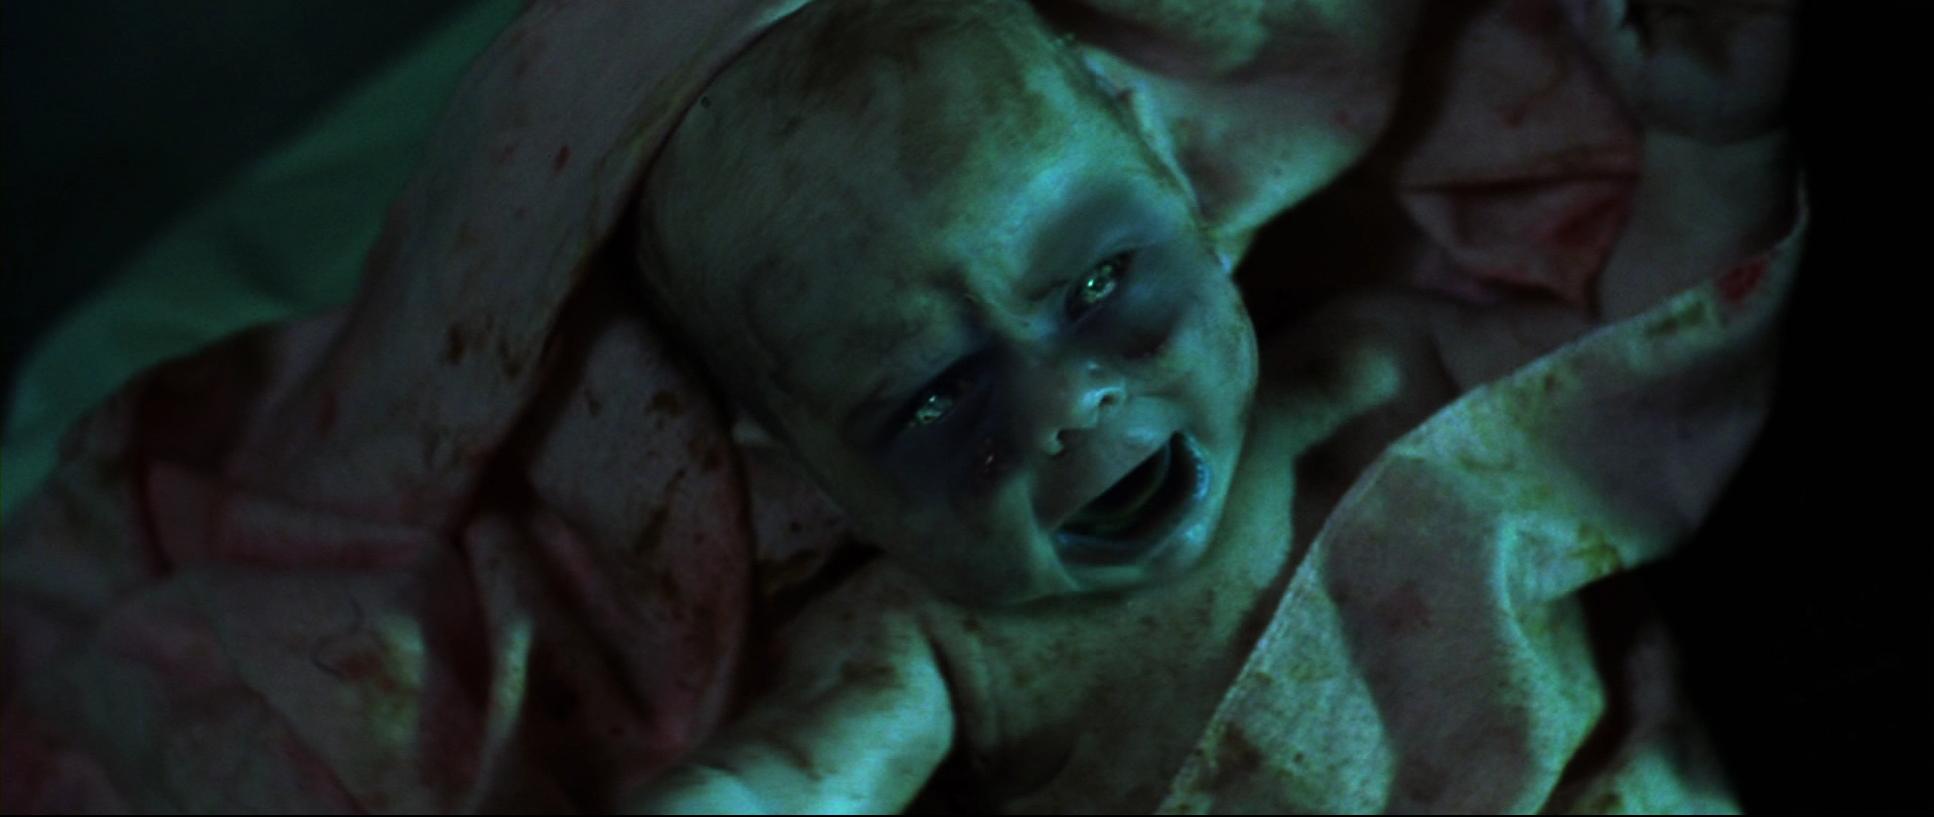 Dead Baby Animatronic Eyes1